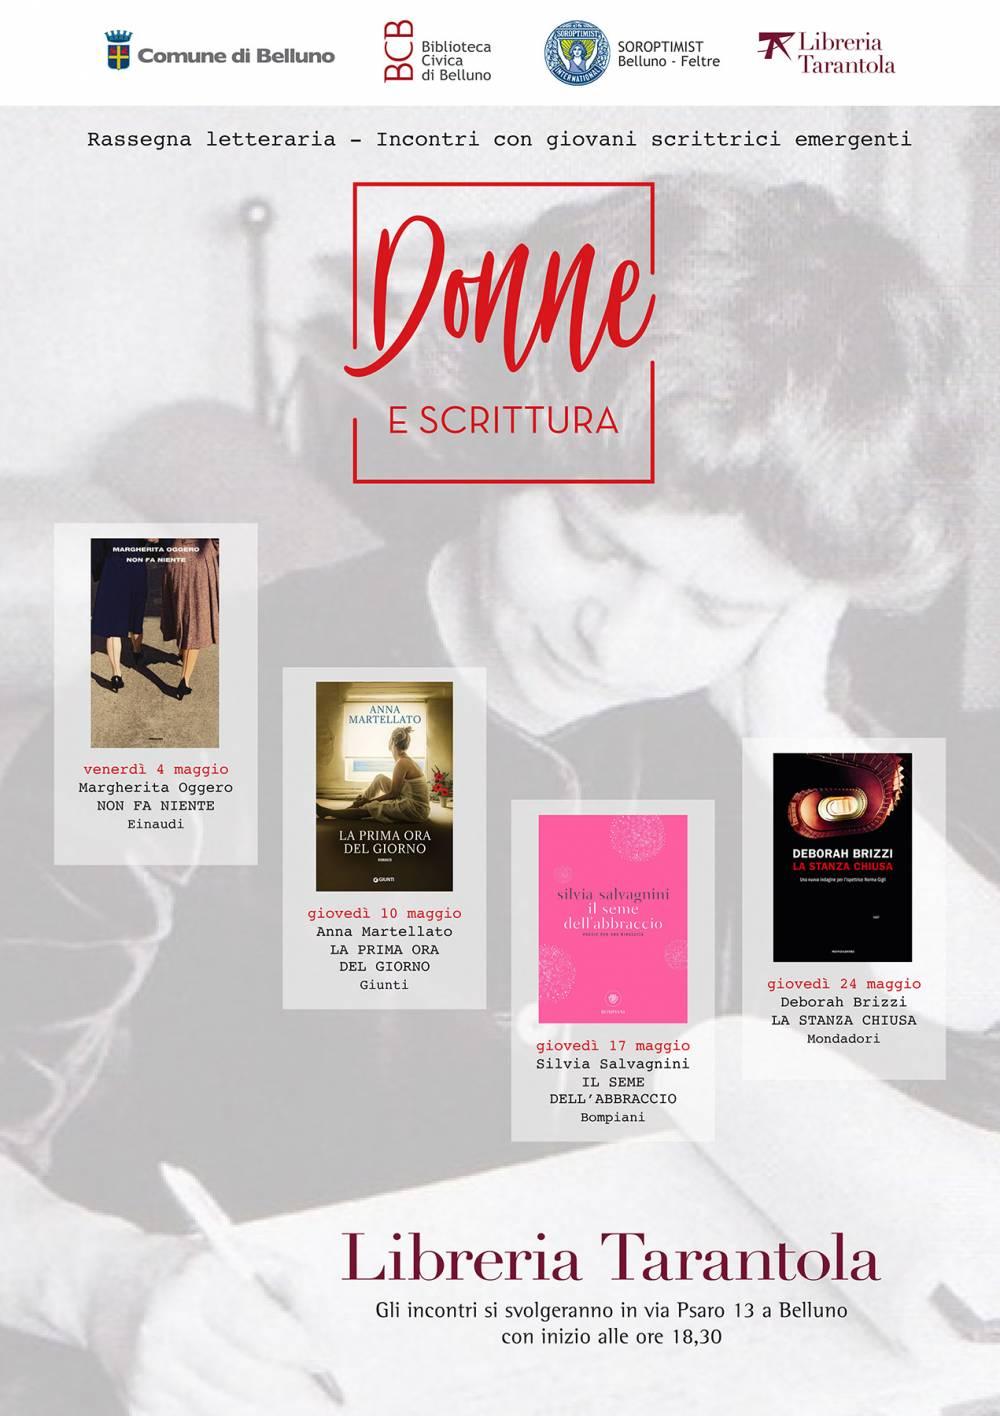 Soroptimist Progetti Si Va In Biblioteca Rassegna Donne E Scrittura